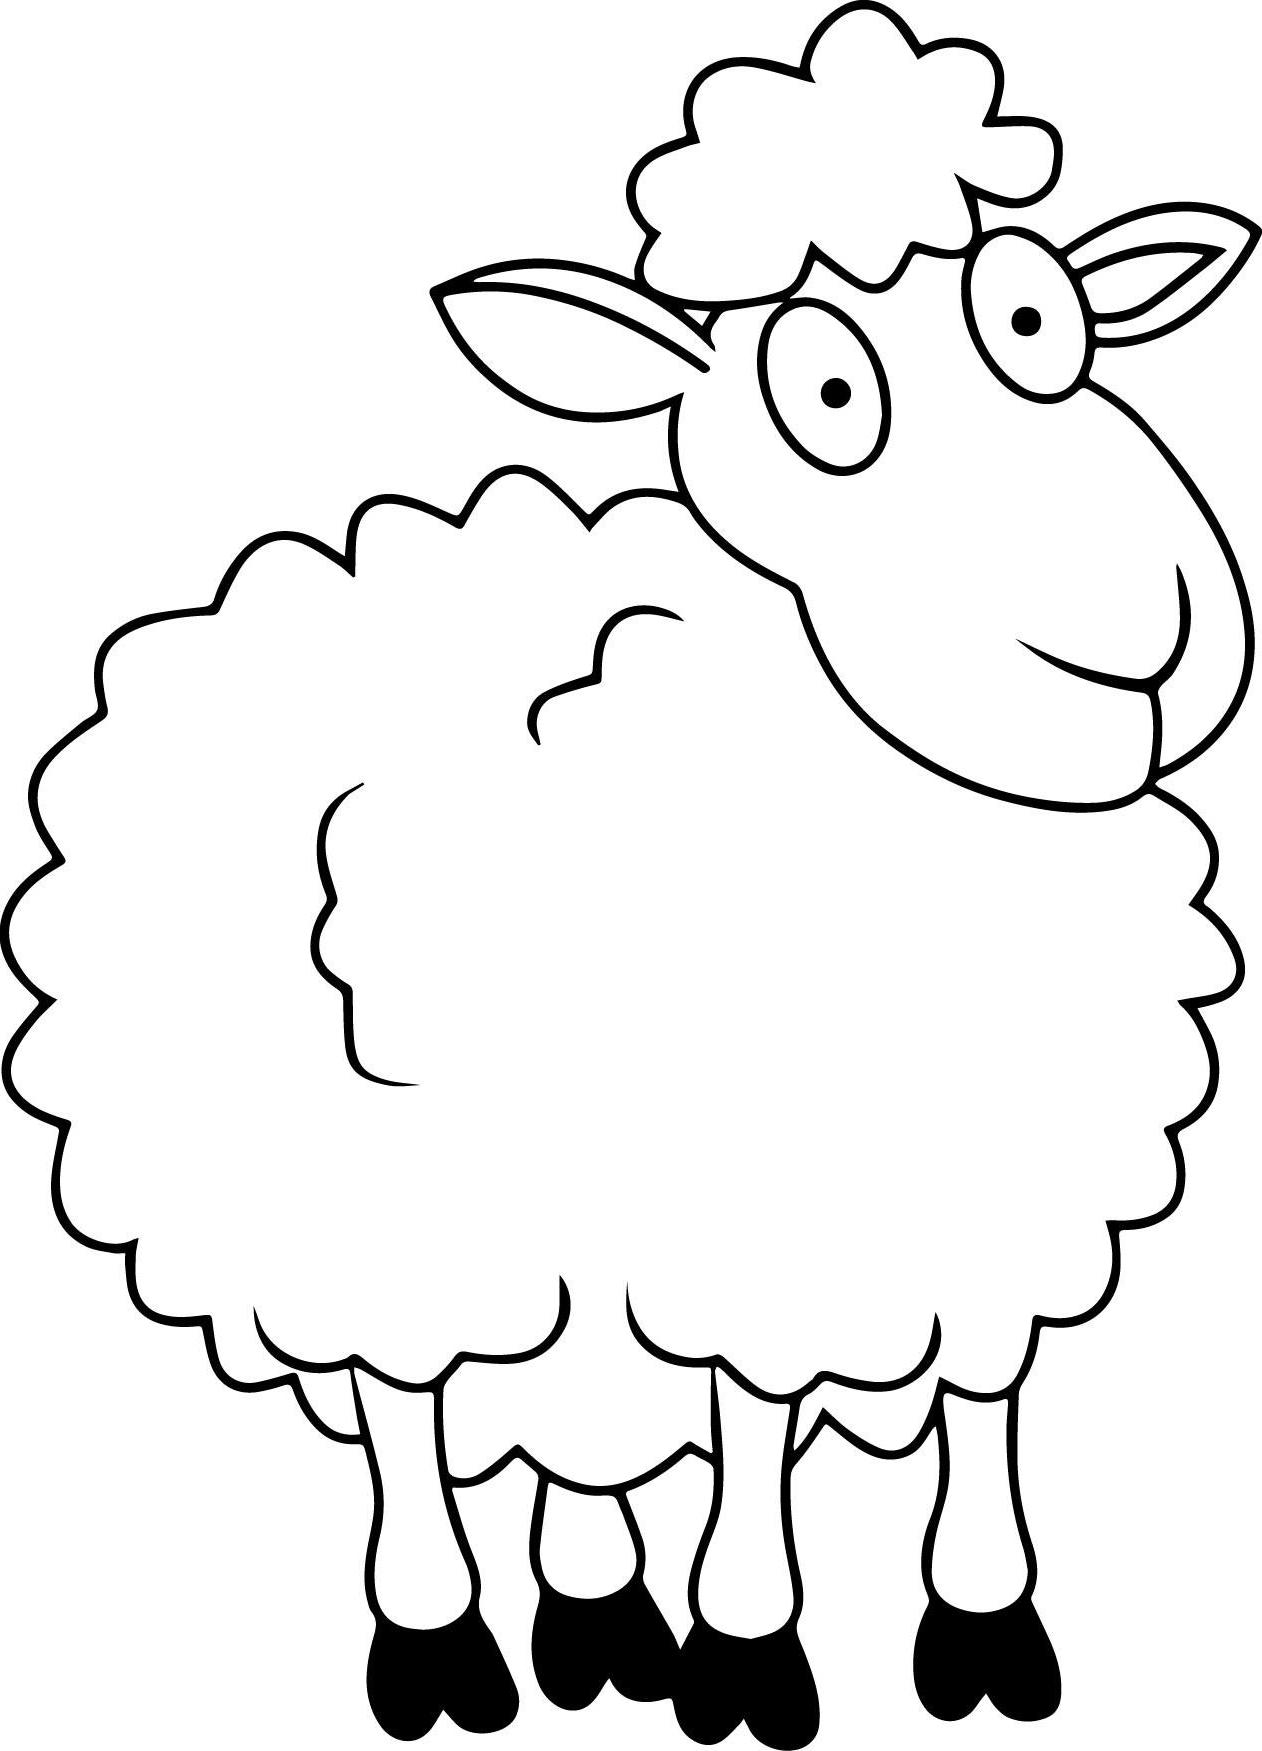 Contoh Gambar Cara Mewarnai Domba Yang Bagus   Kataucap throughout Gambar Domba Mewarnai